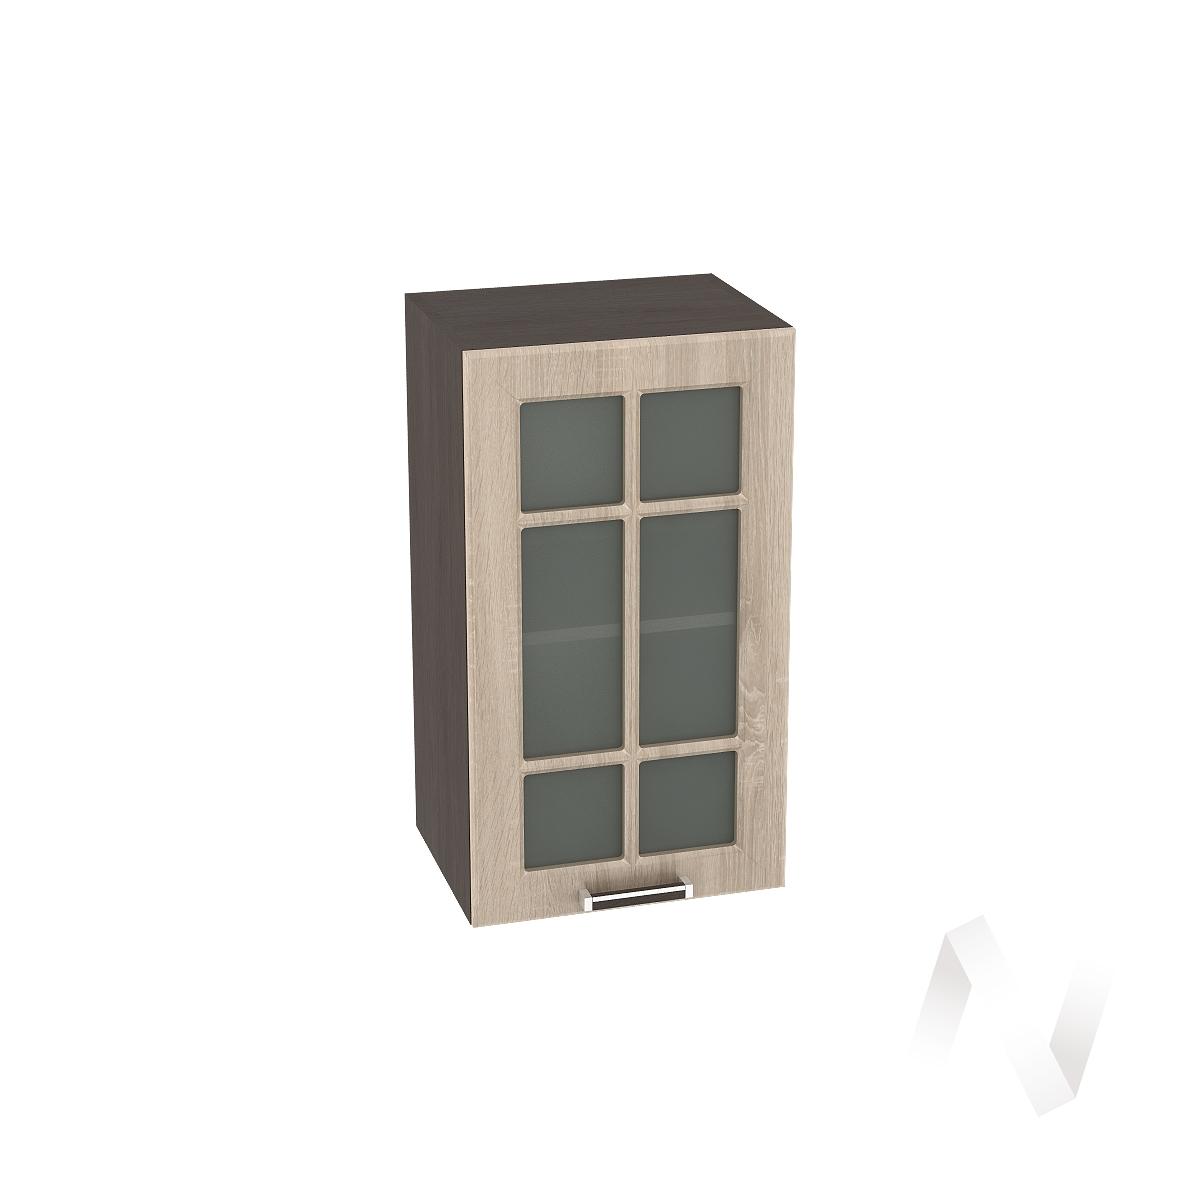 "Кухня ""Прага"": Шкаф верхний со стеклом 400, ШВС 400 (дуб сонома/корпус венге)"